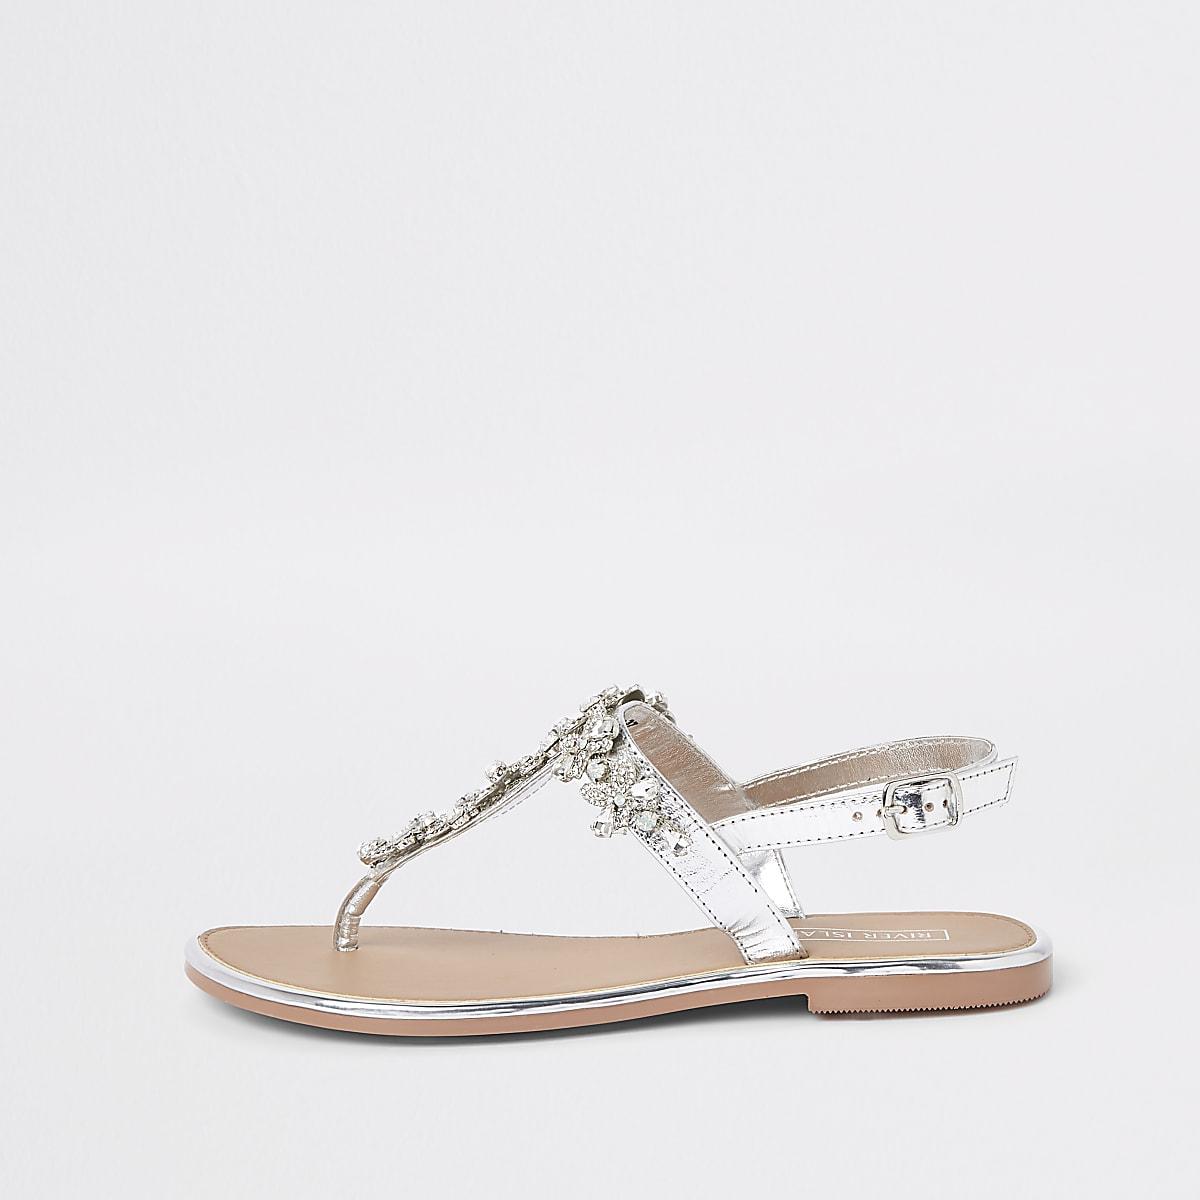 Silver leather jewel embellished flat sandals